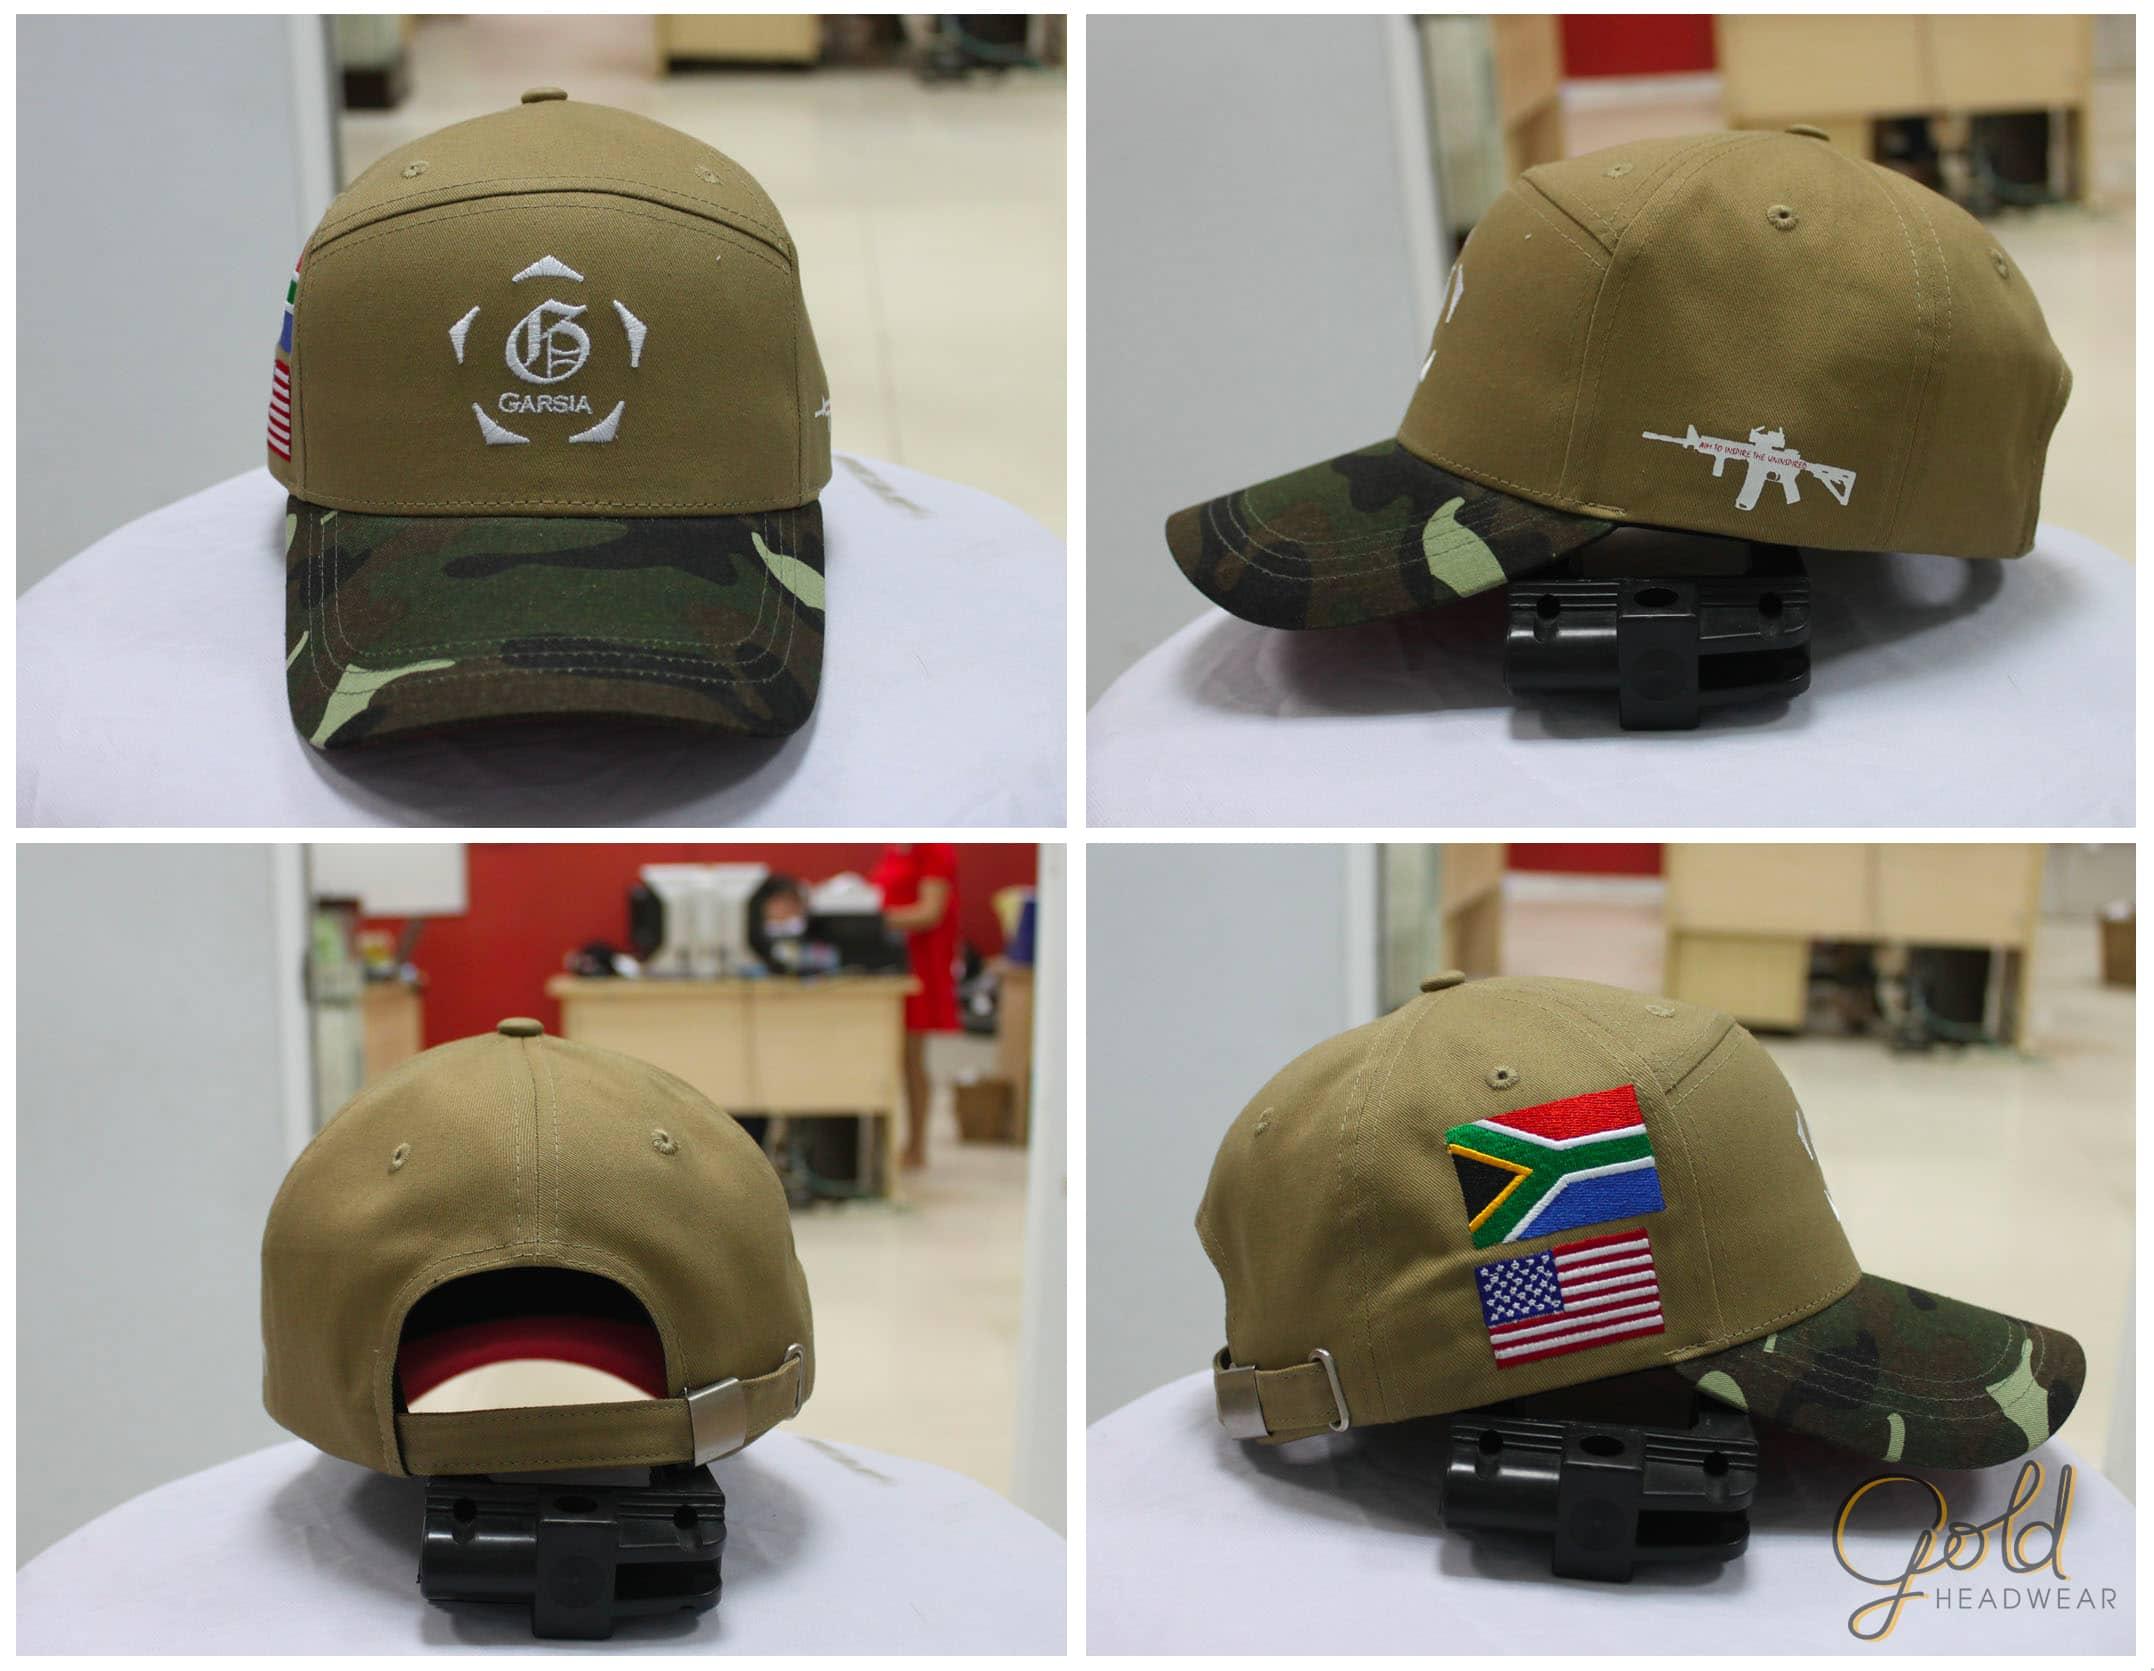 Custom hybrid baseball cap